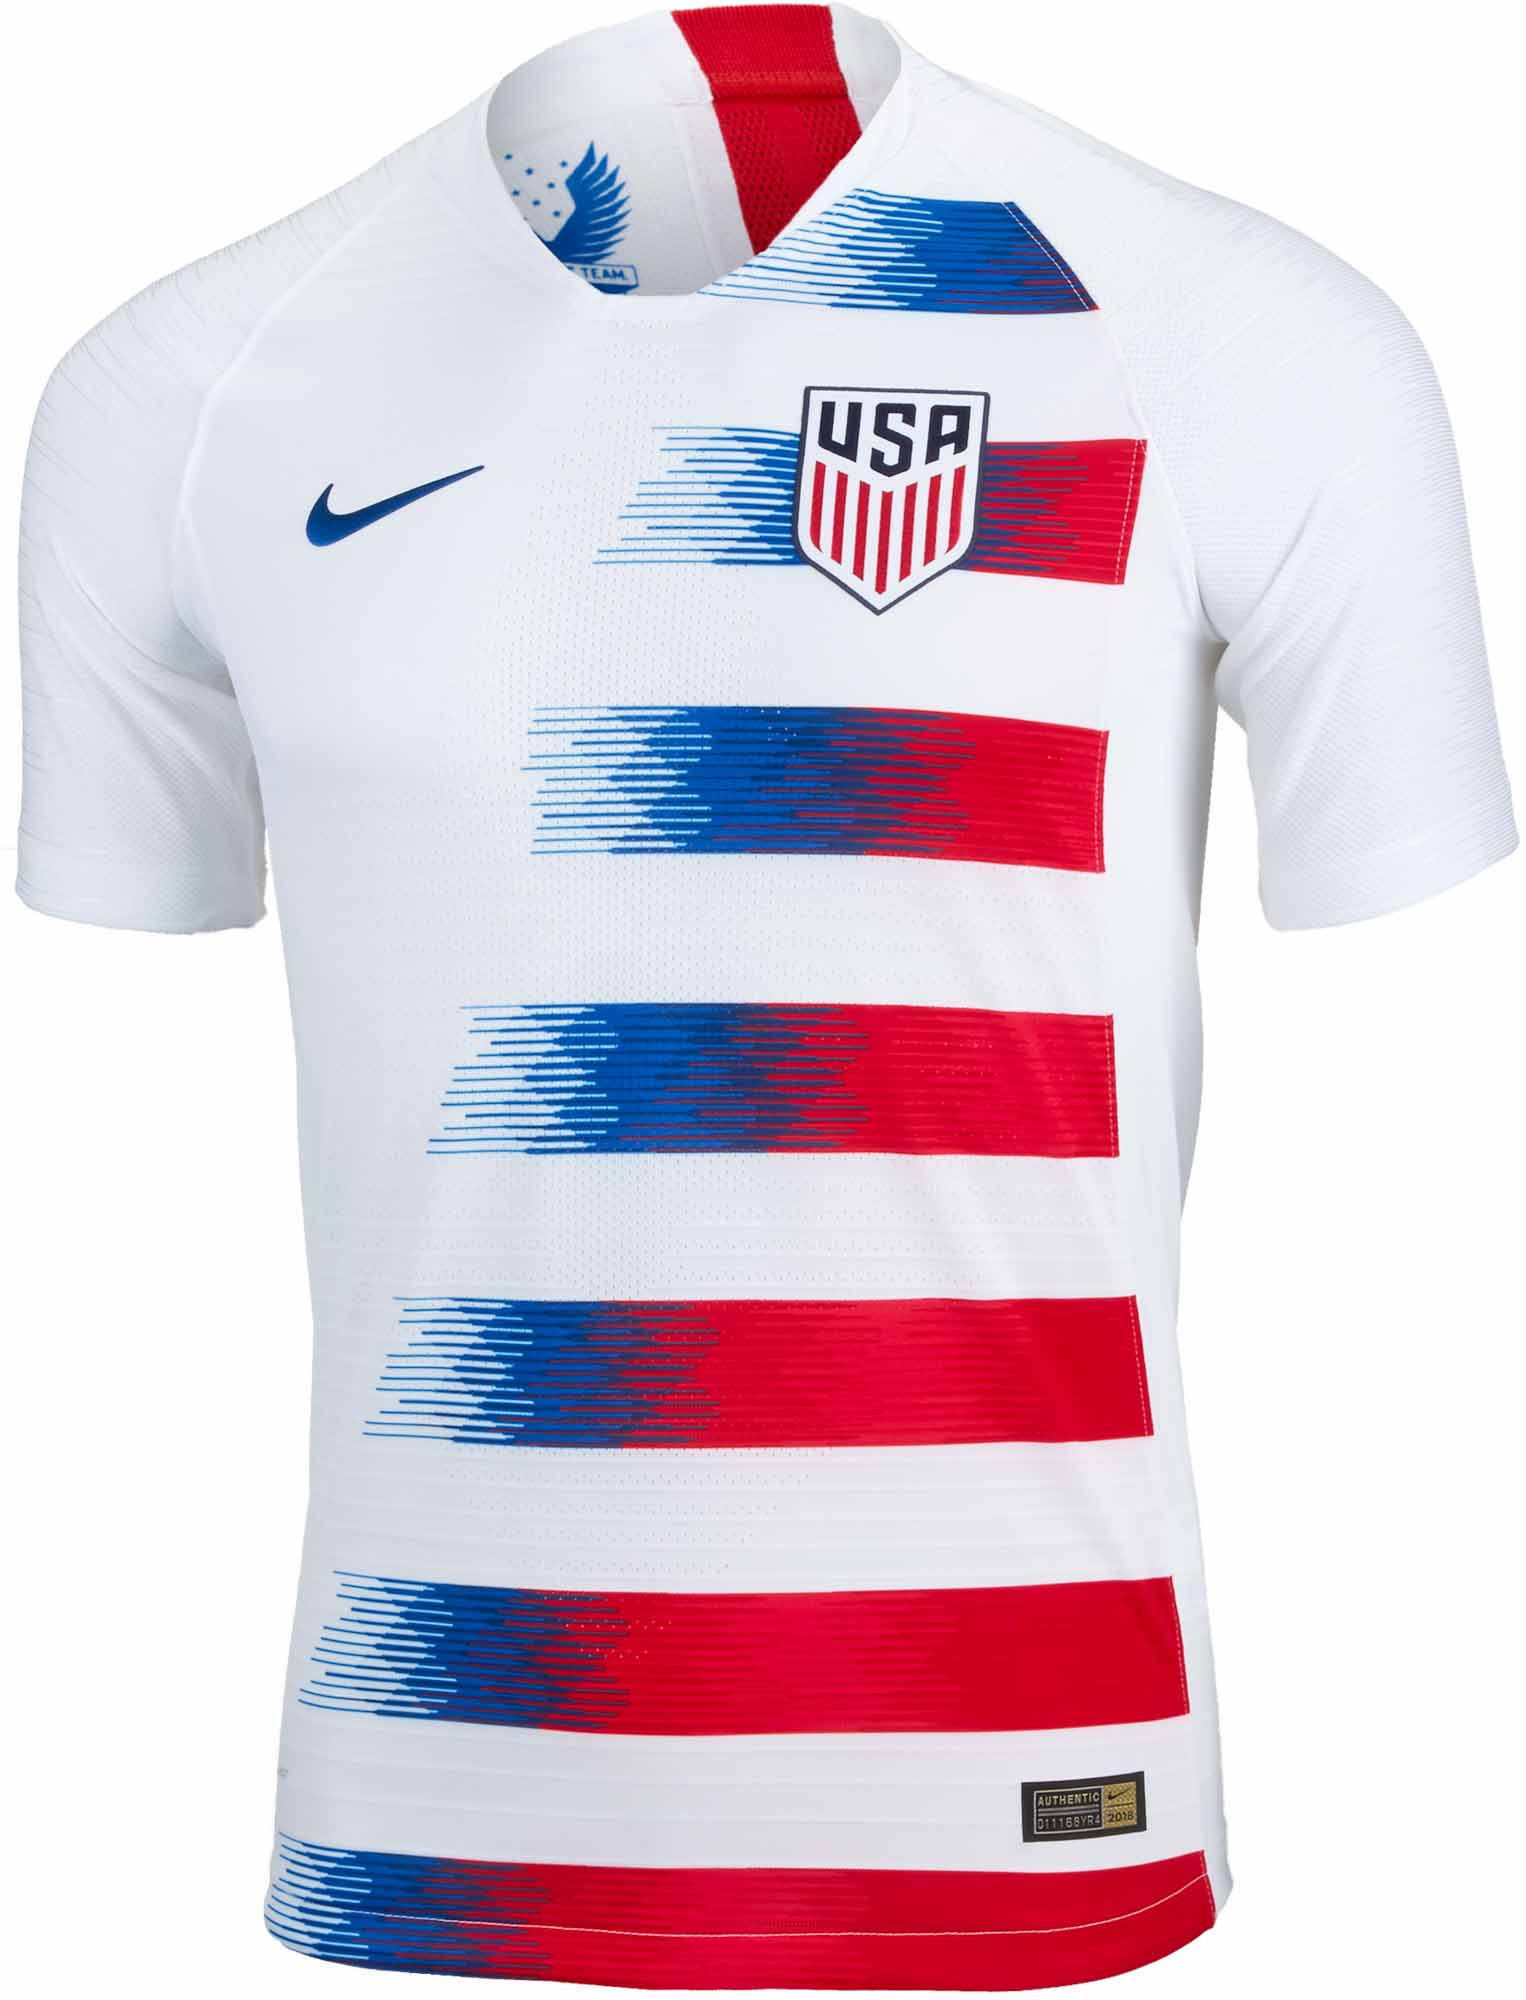 835f6c8c8 Nike USA Home Match Jersey 2018-19 - SoccerPro.com